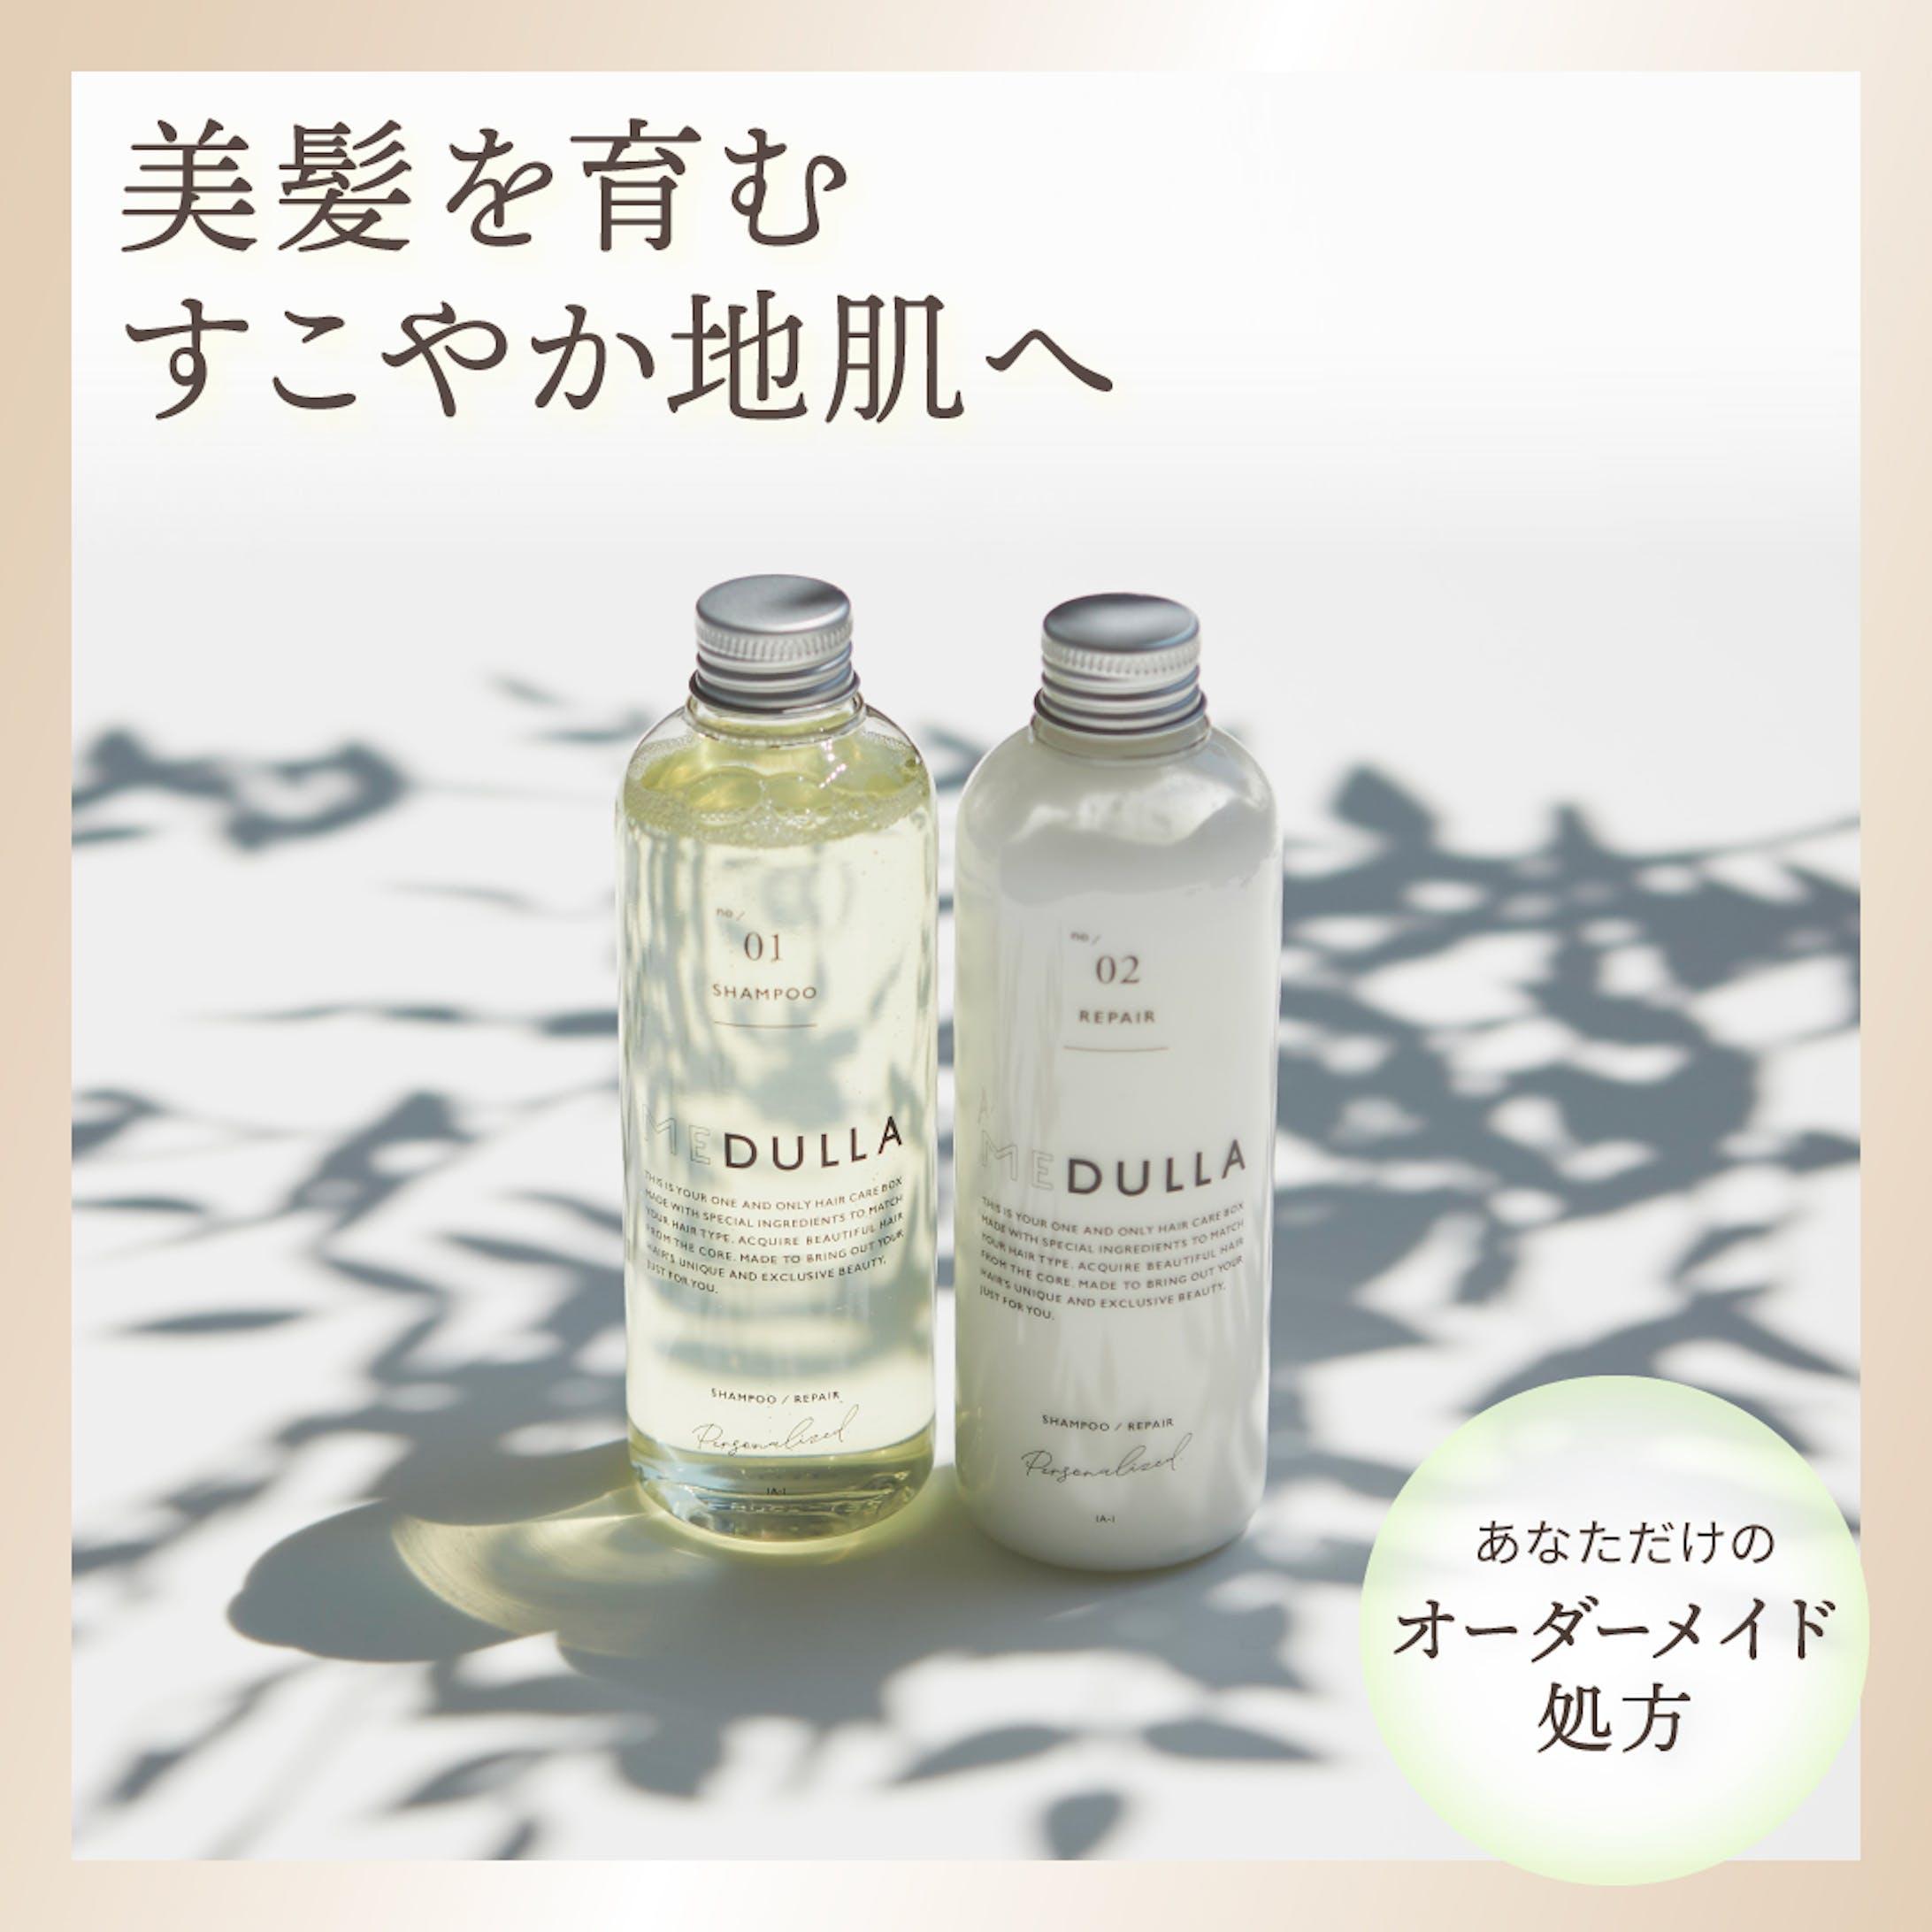 【SNS用バナー】(株)Sparty様 Medulla-2